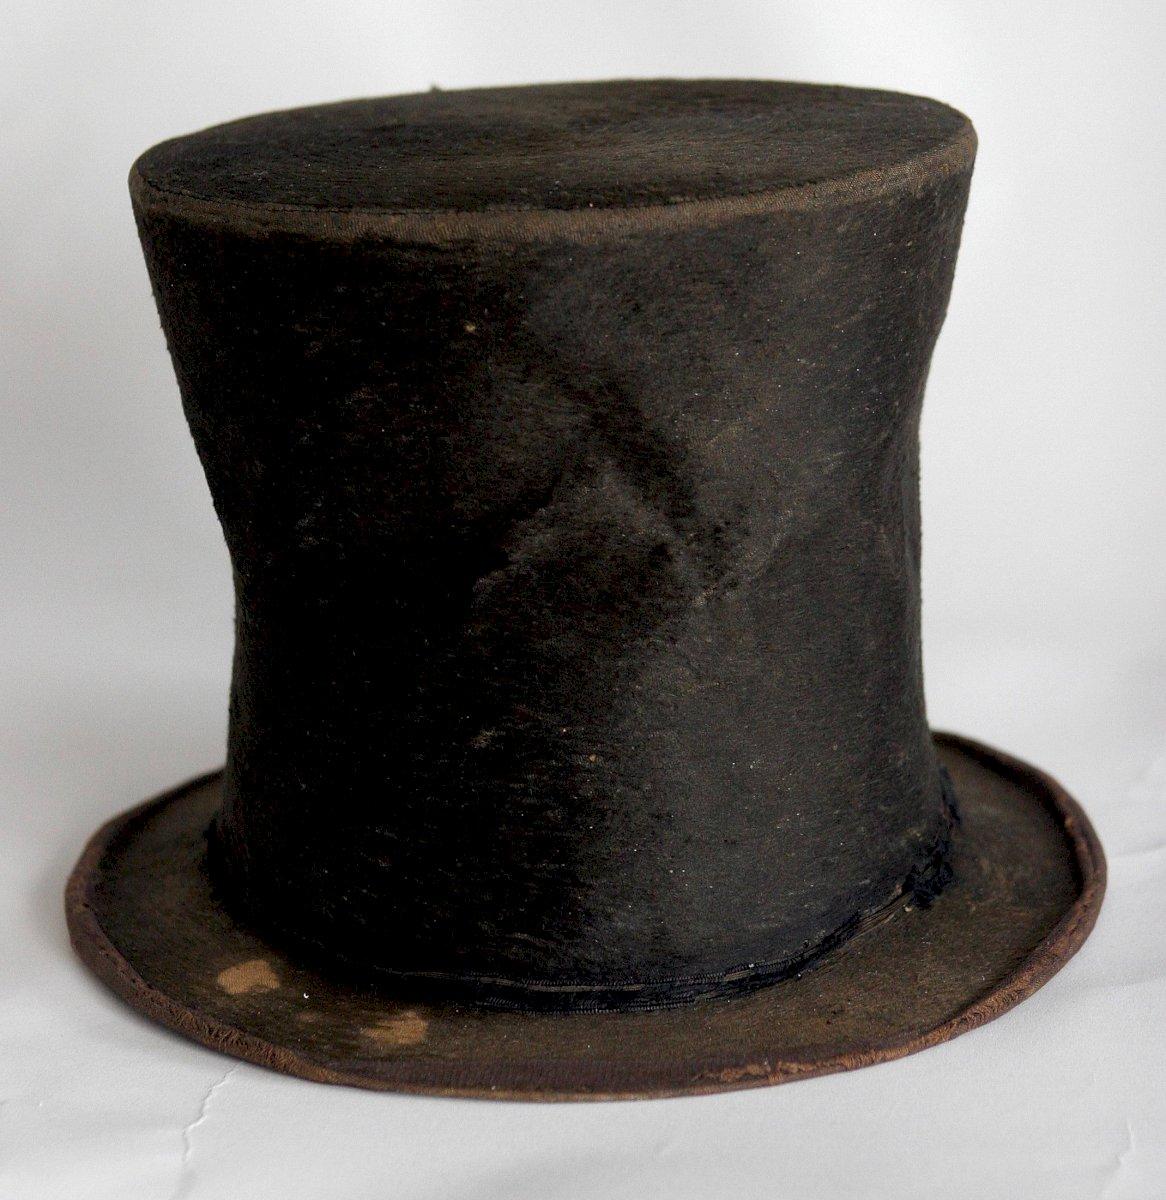 Sombrero que presuntamente era de Abraham Lincoln